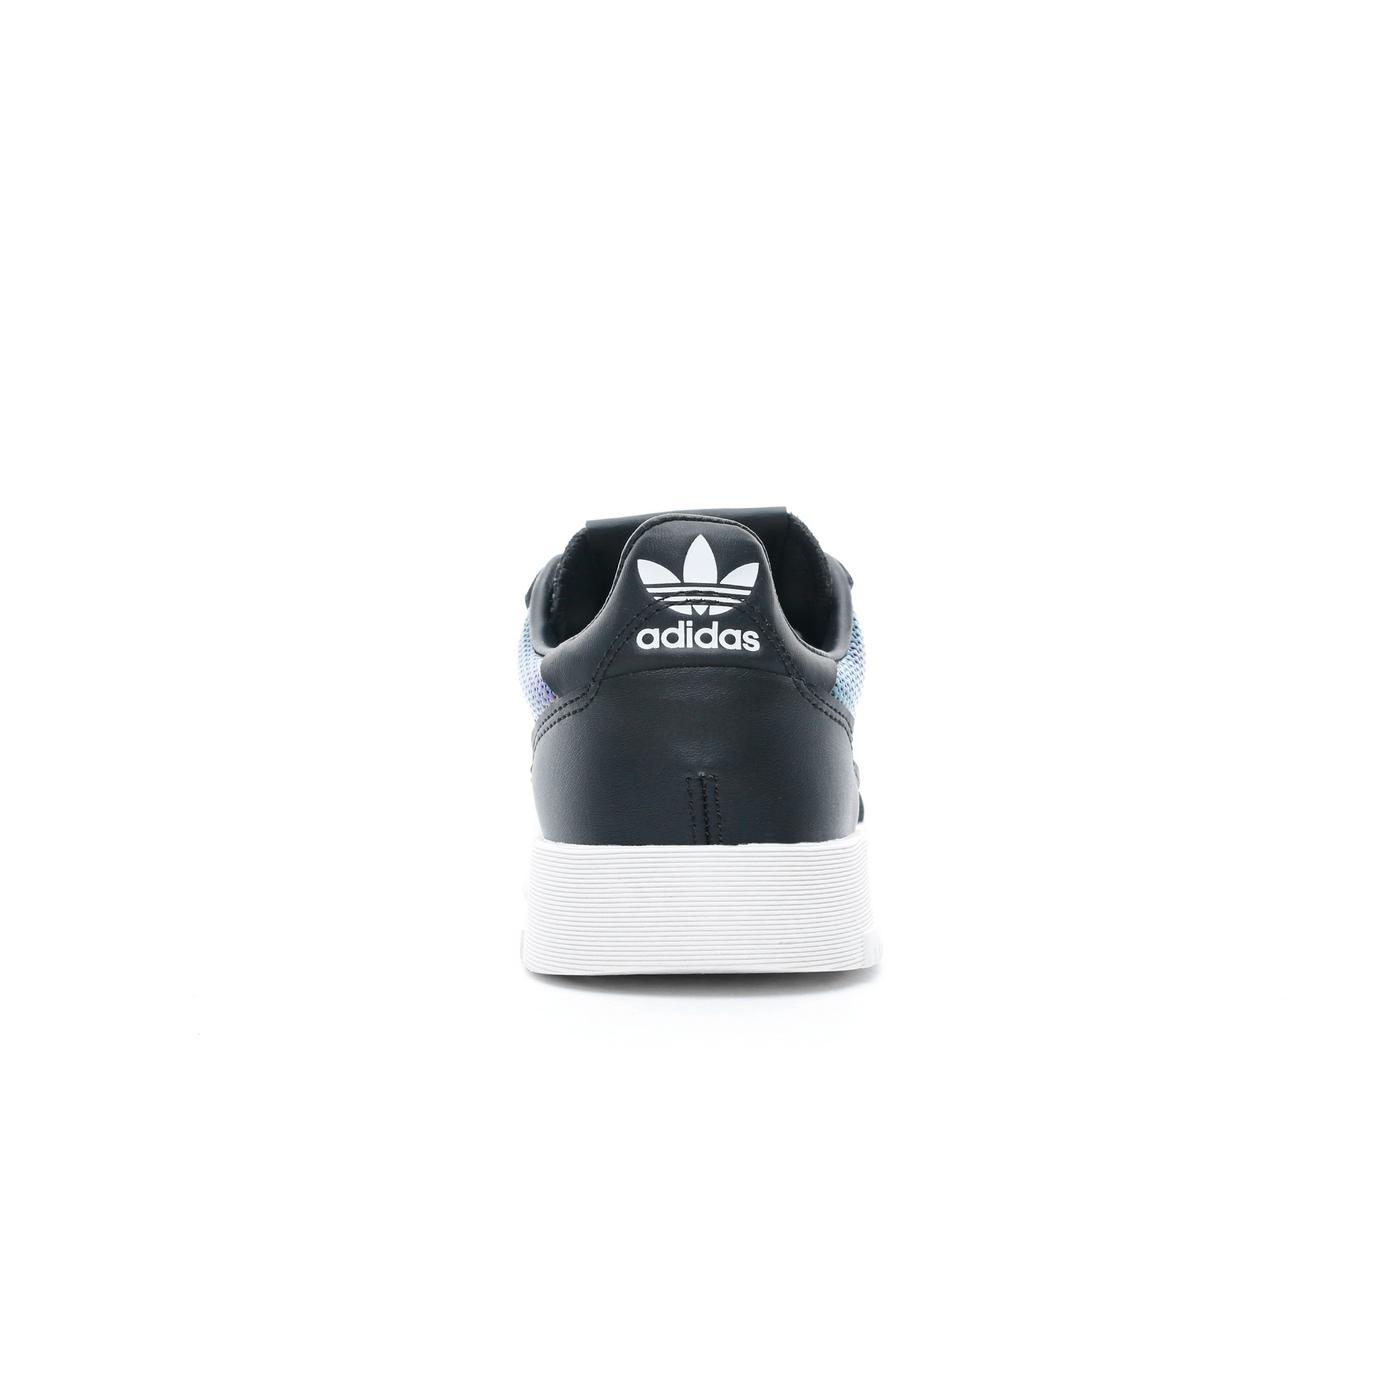 adidas Supercourt Kadın Siyah Spor Ayakkabı